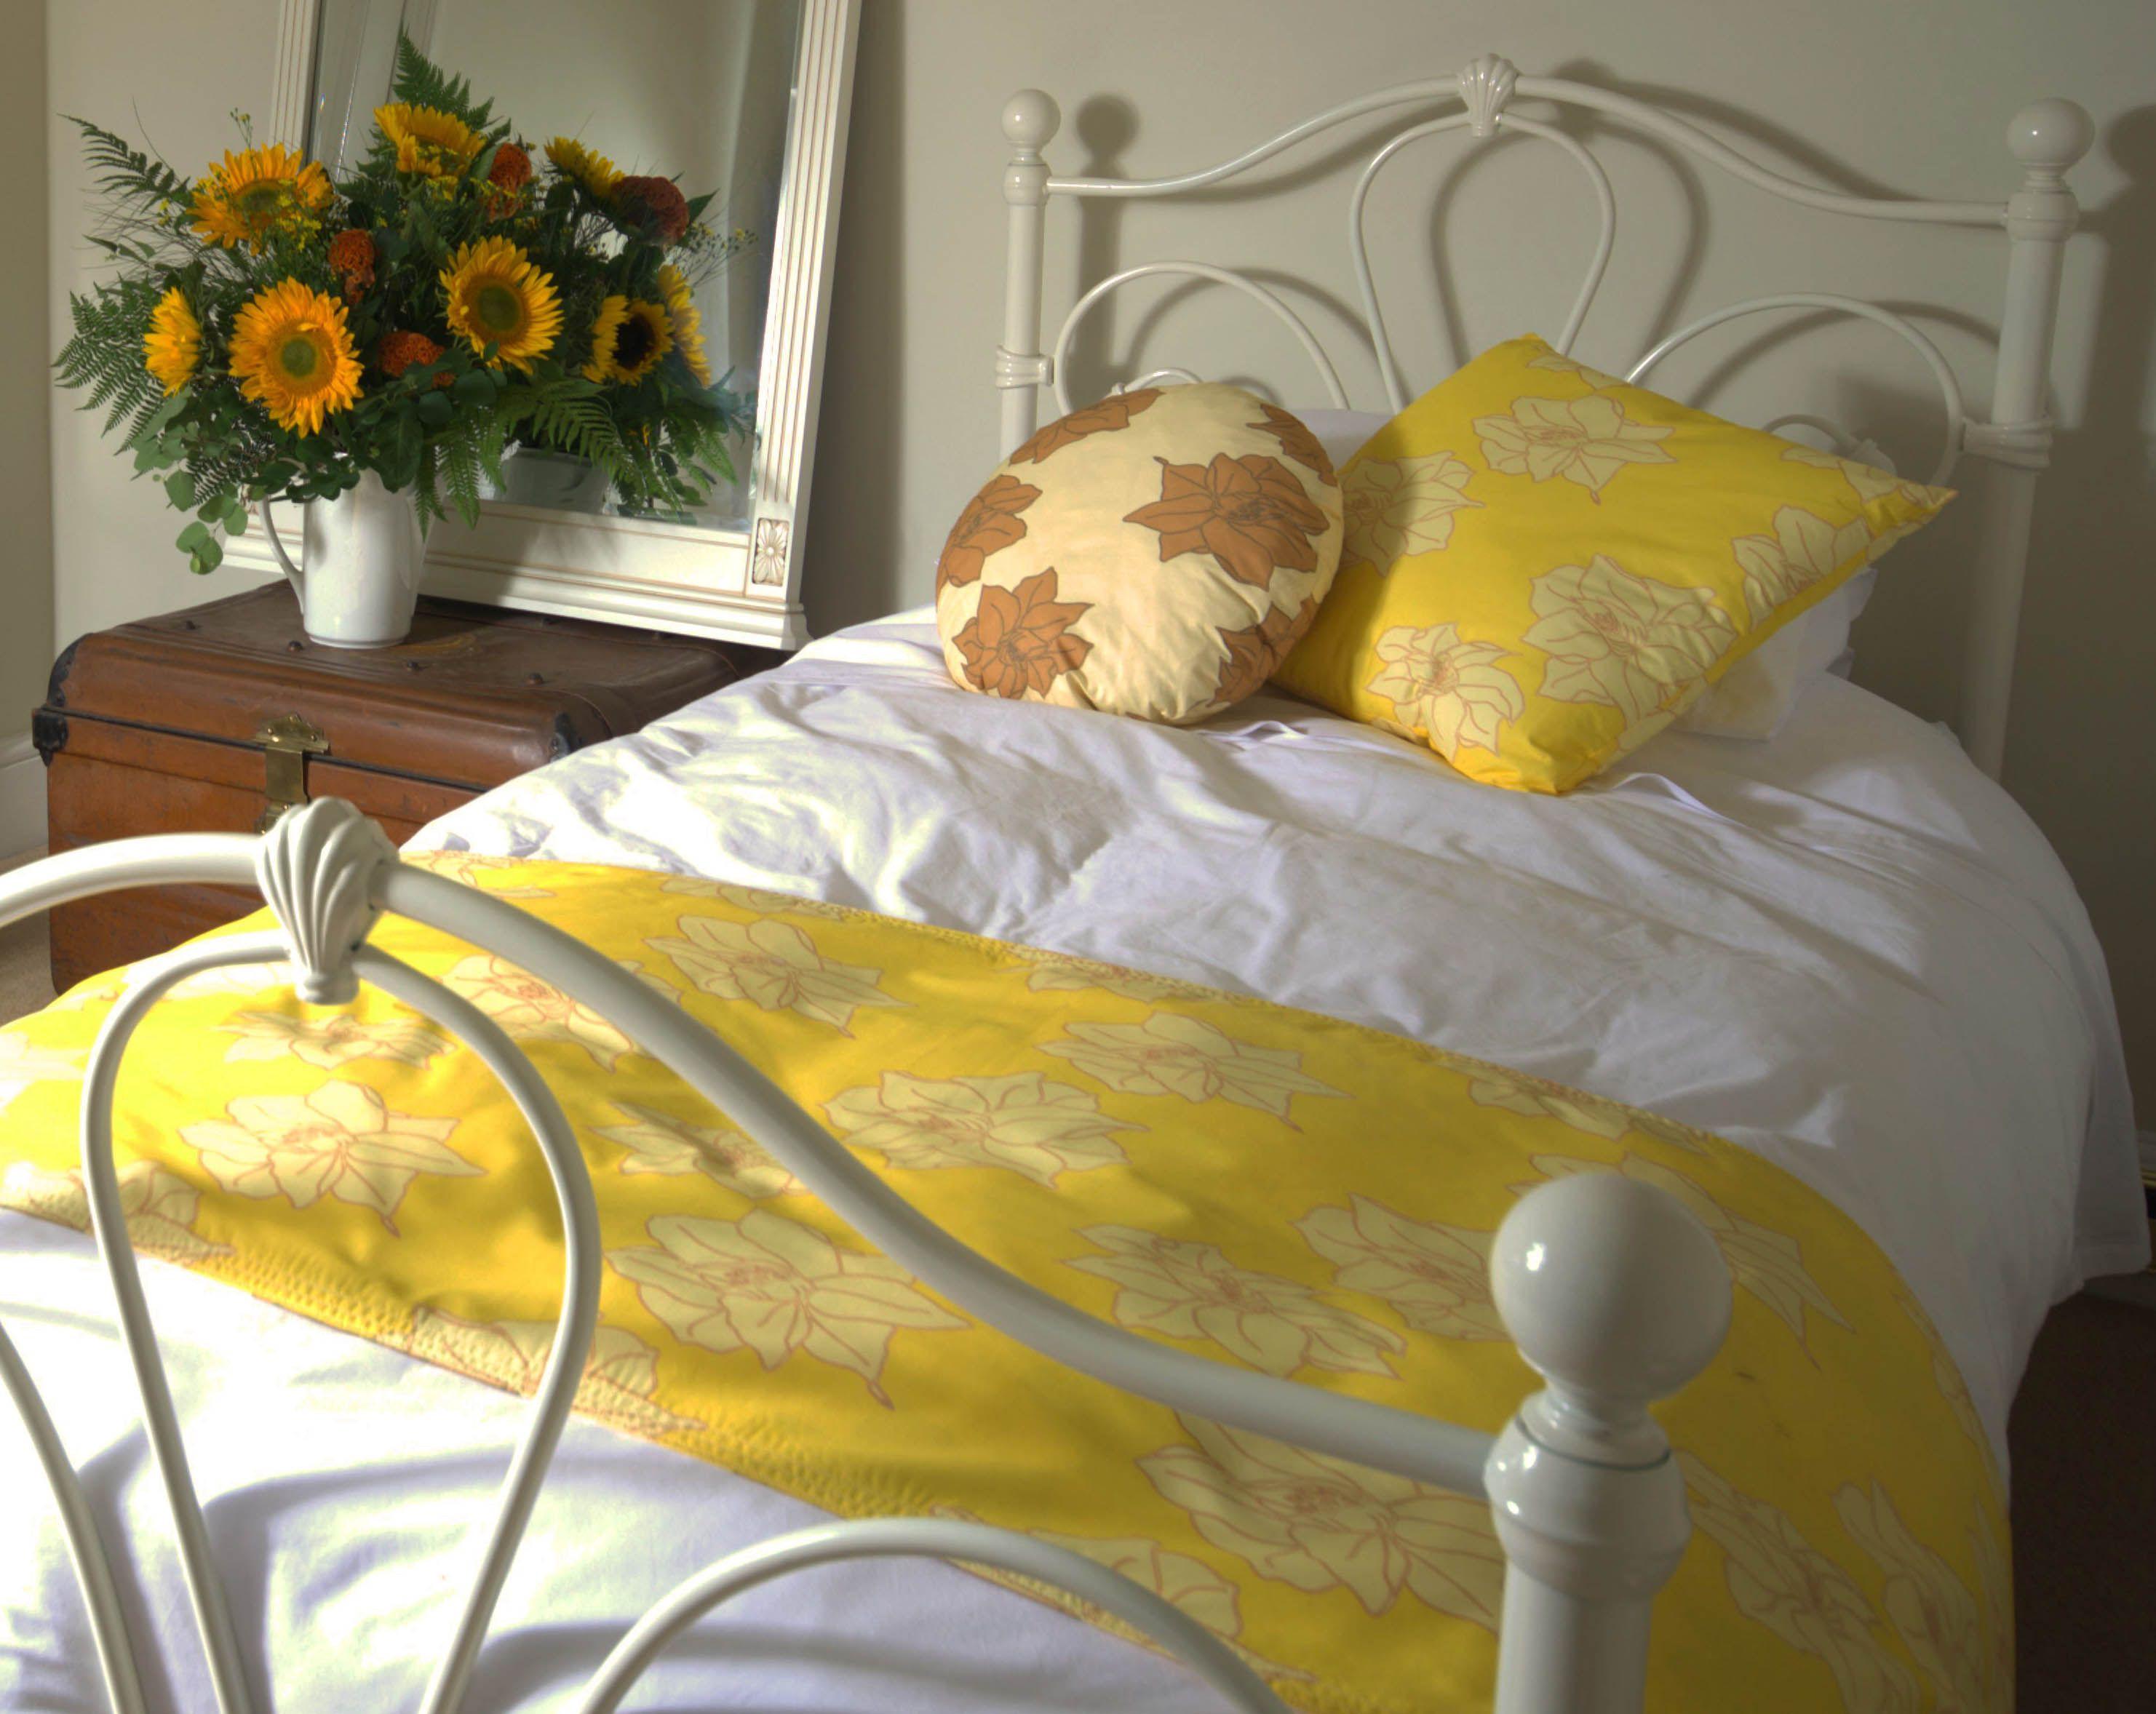 larkspur fabric in bedroom set up